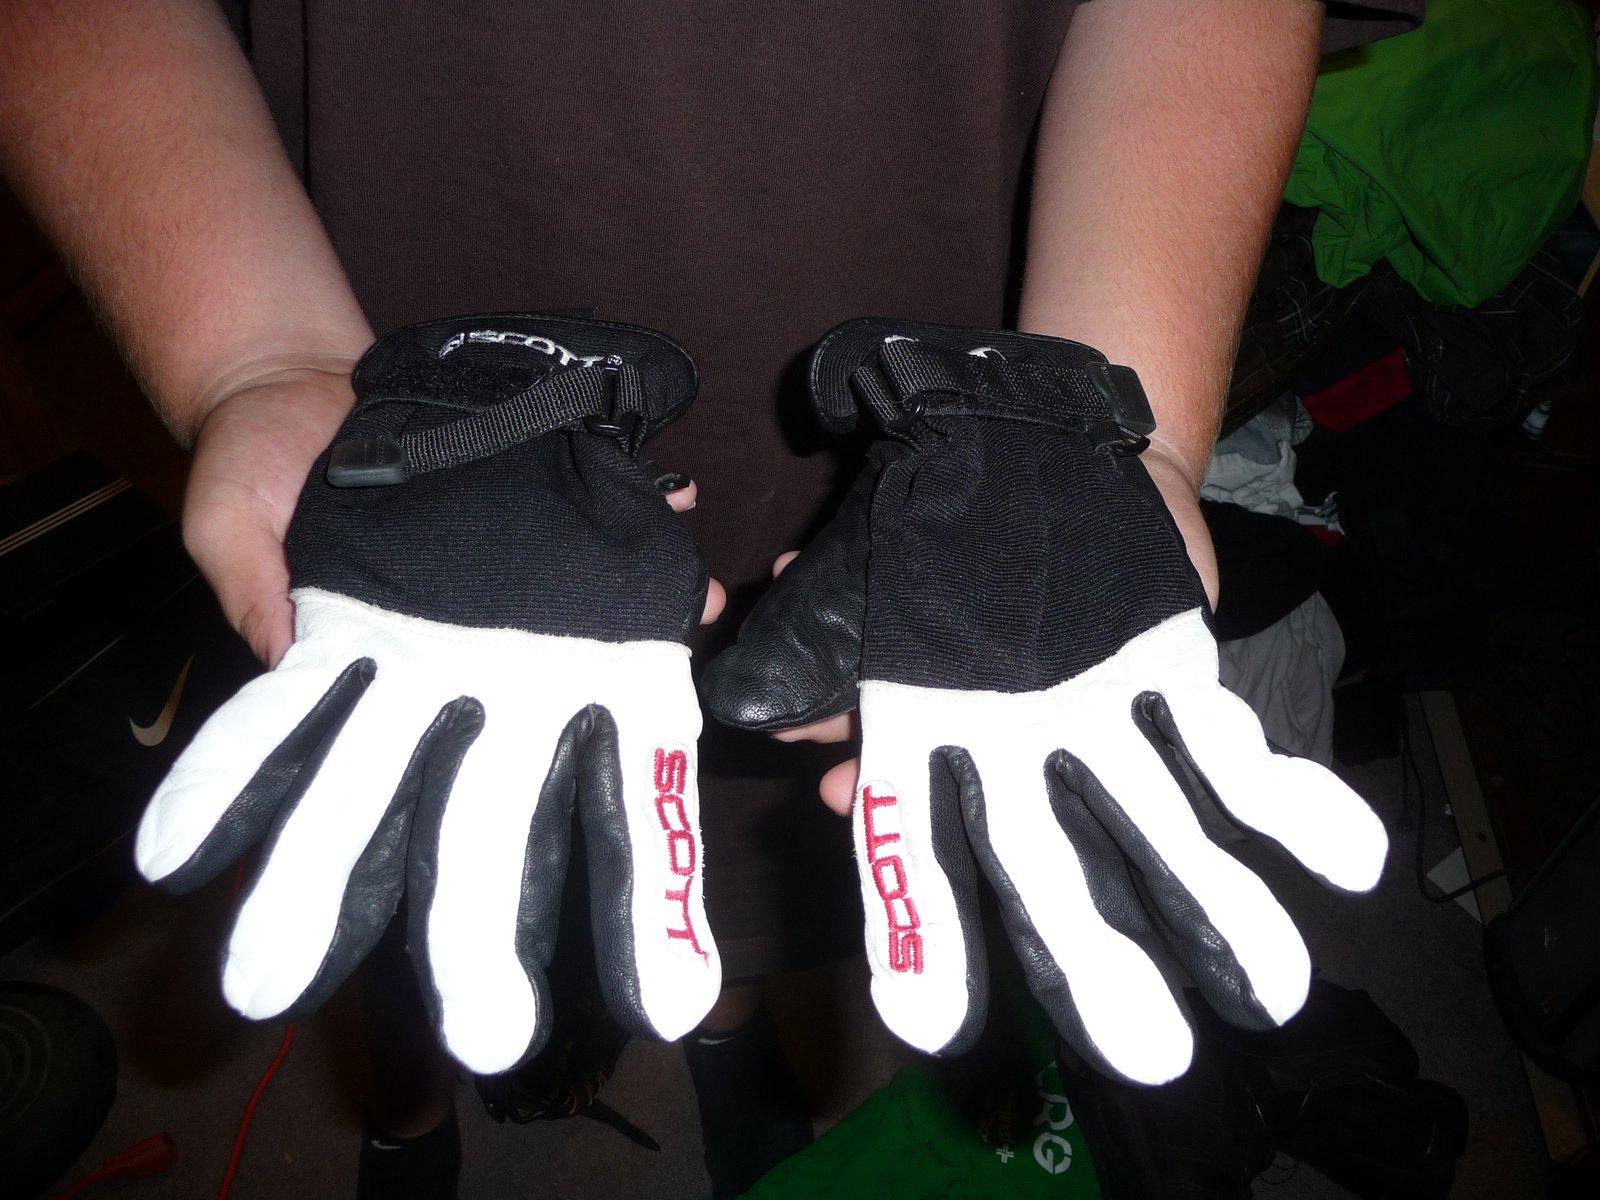 Scott spring ski gloves